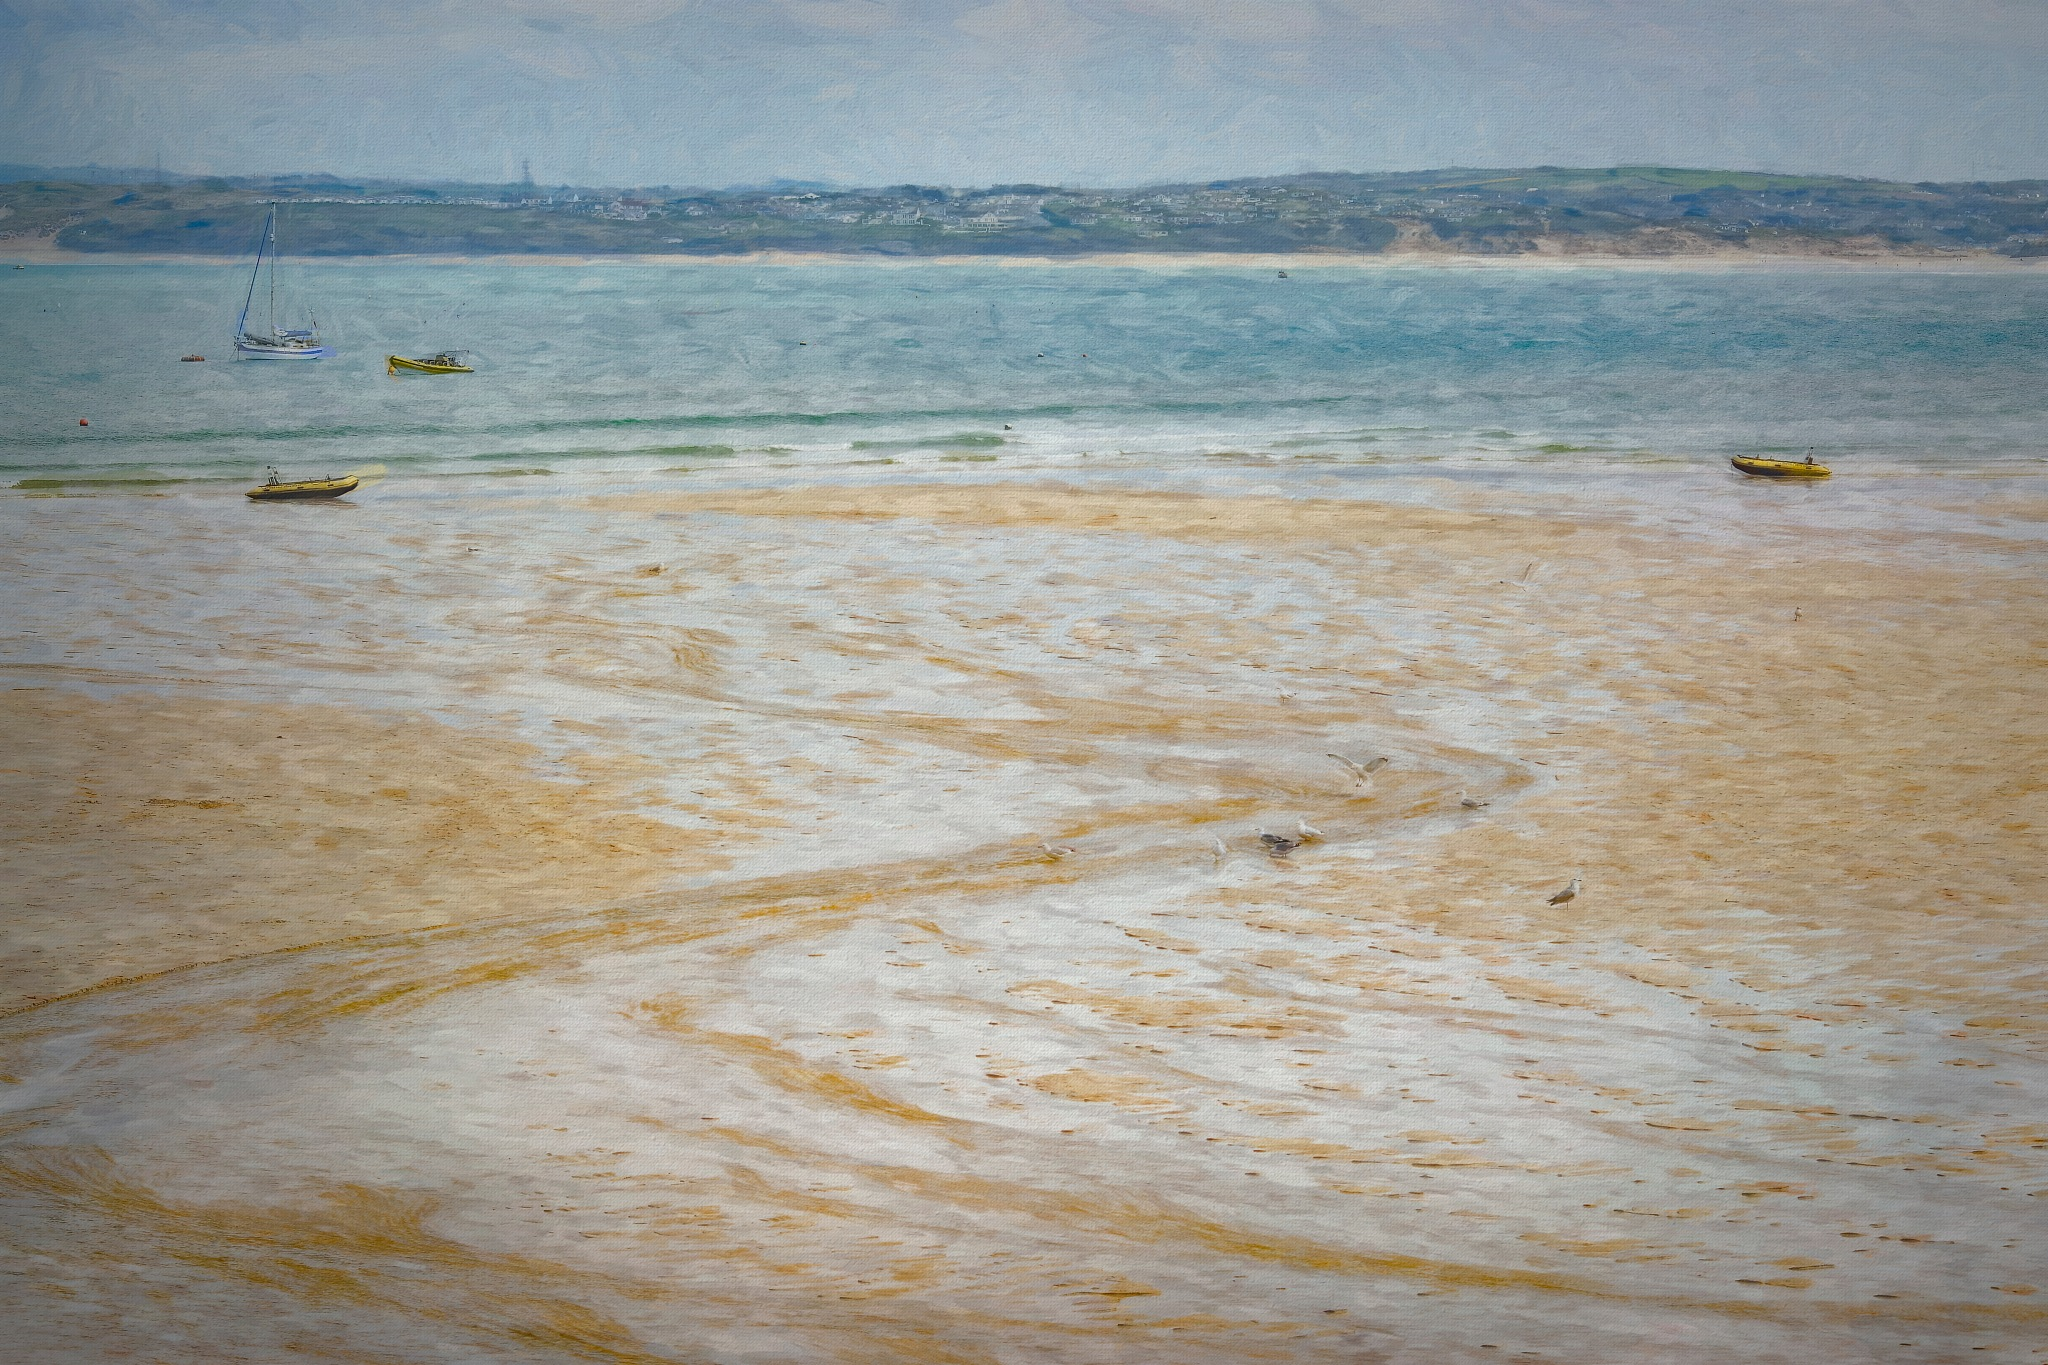 St. Ives Beach by stephen.harding.735